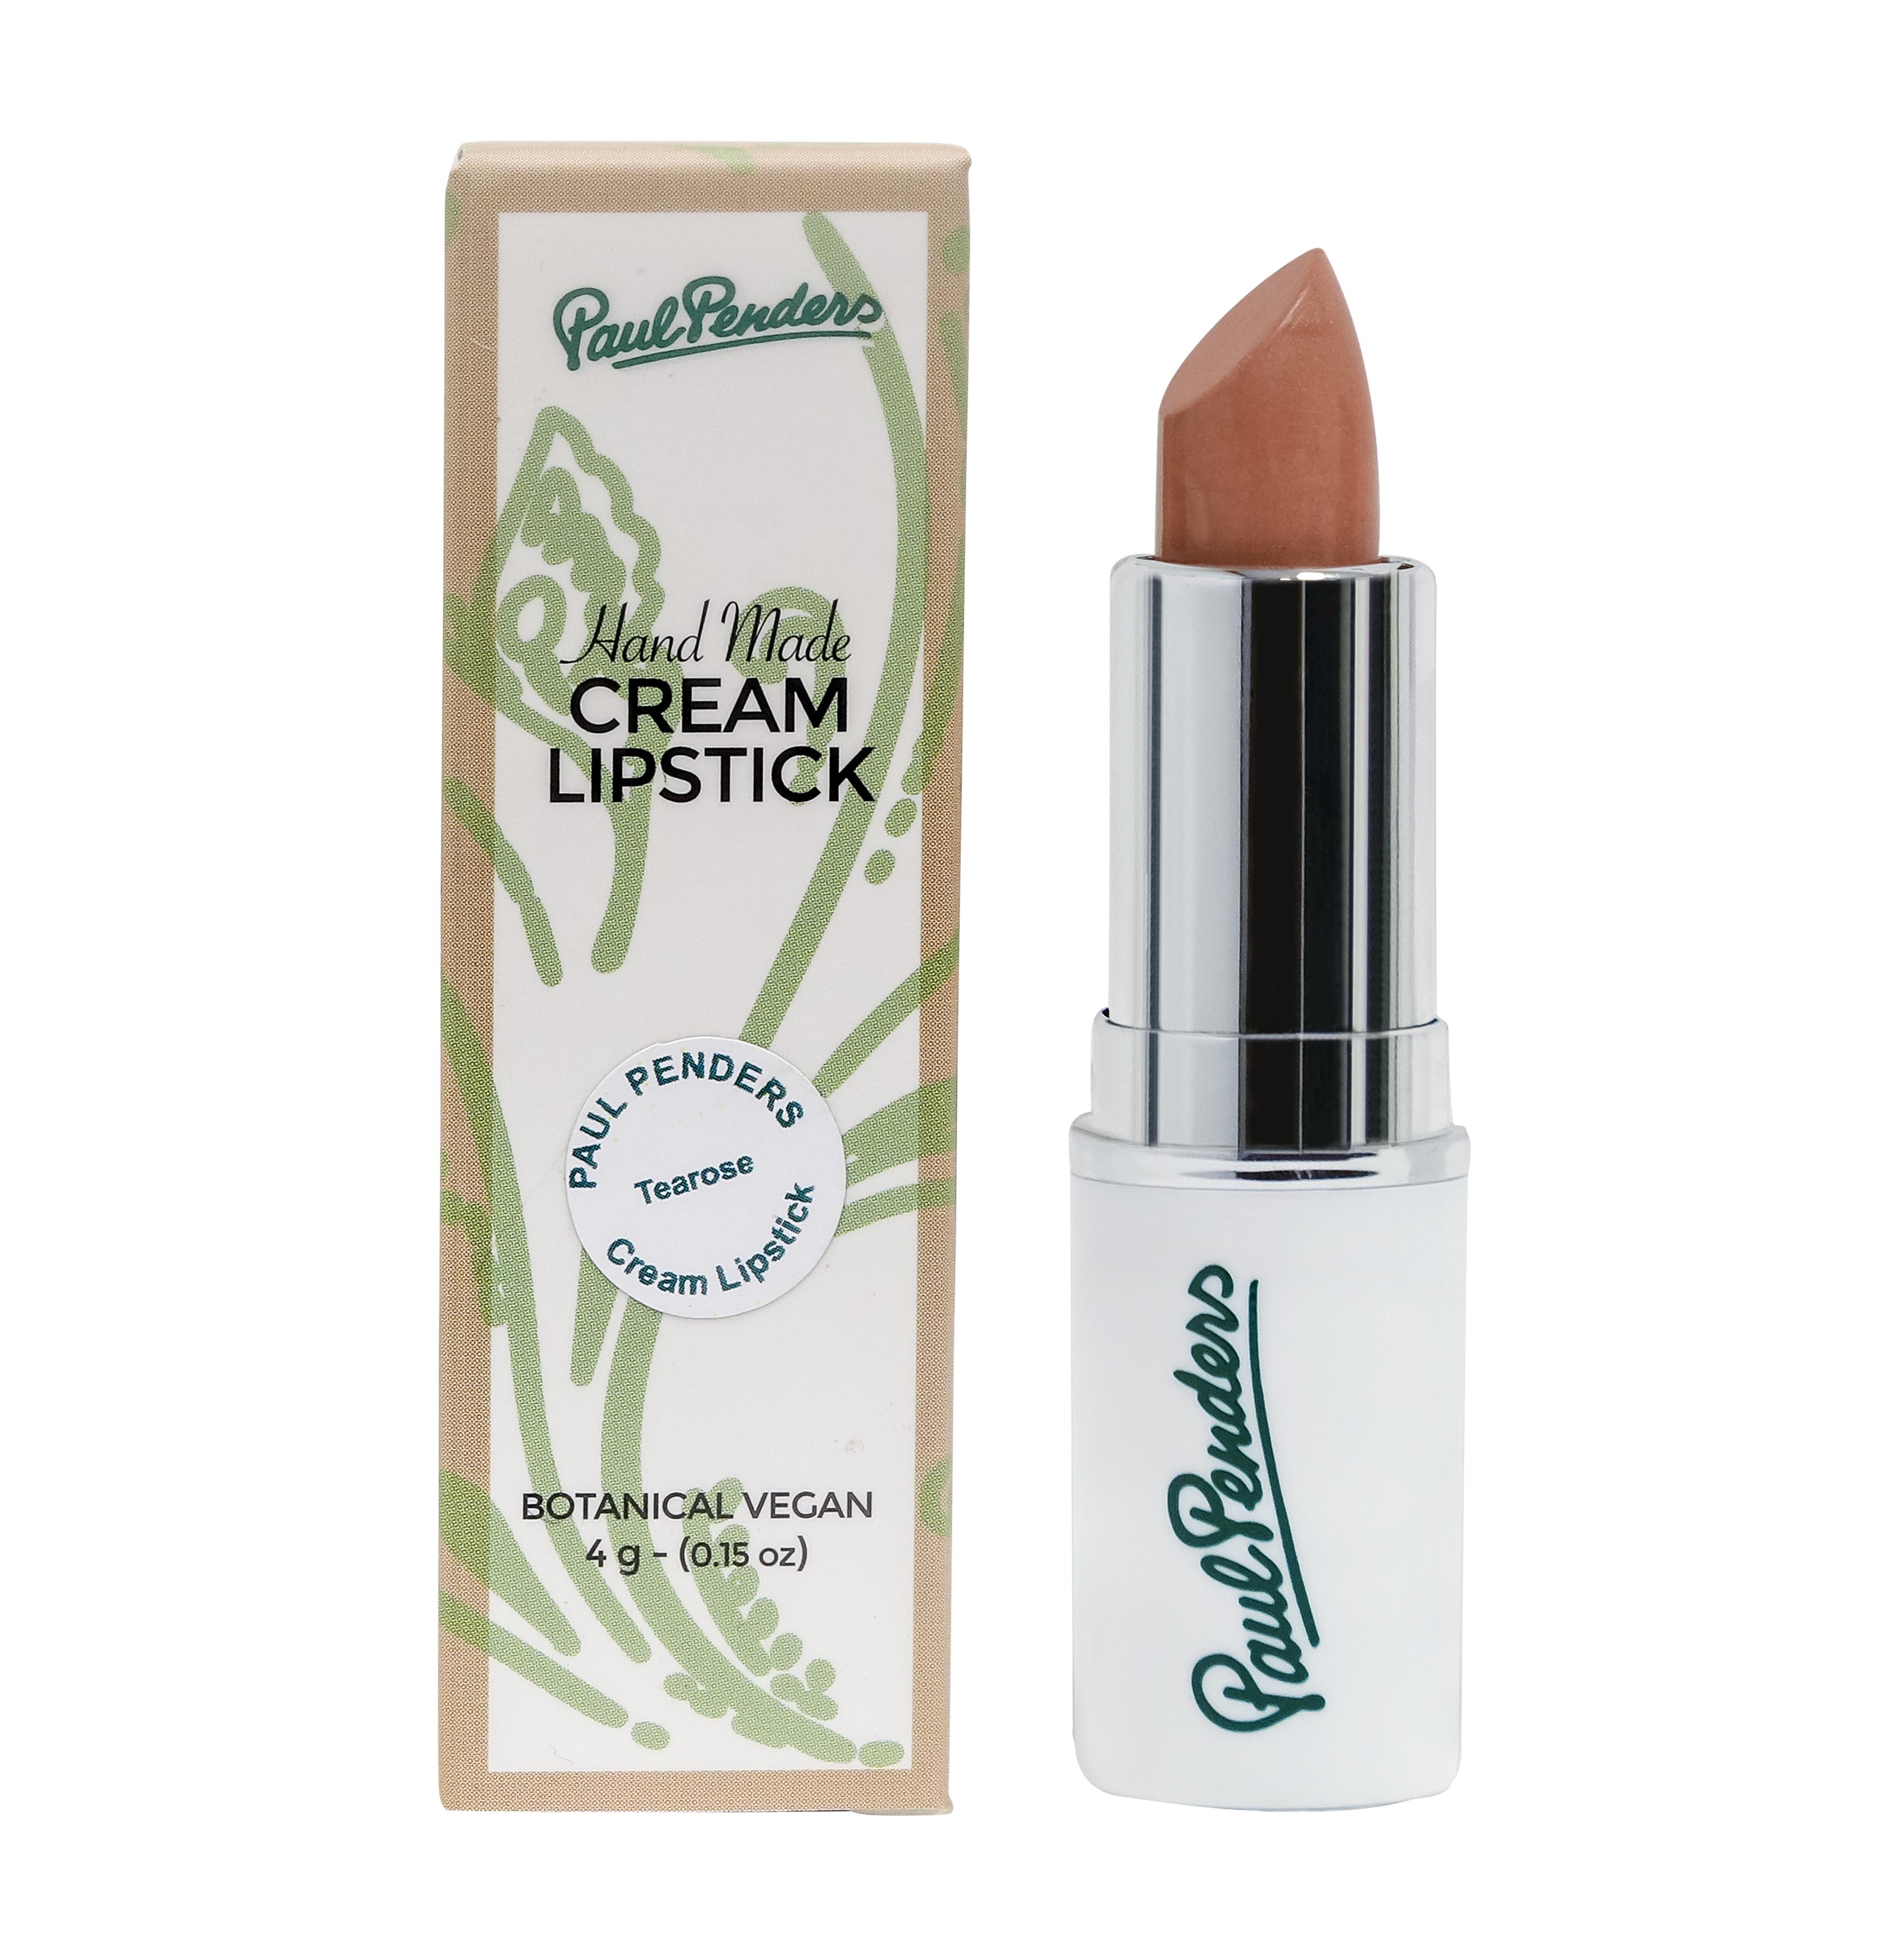 [MPLUS] PAUL PENDERS Handmade Cream Lipstick Tearose 4g